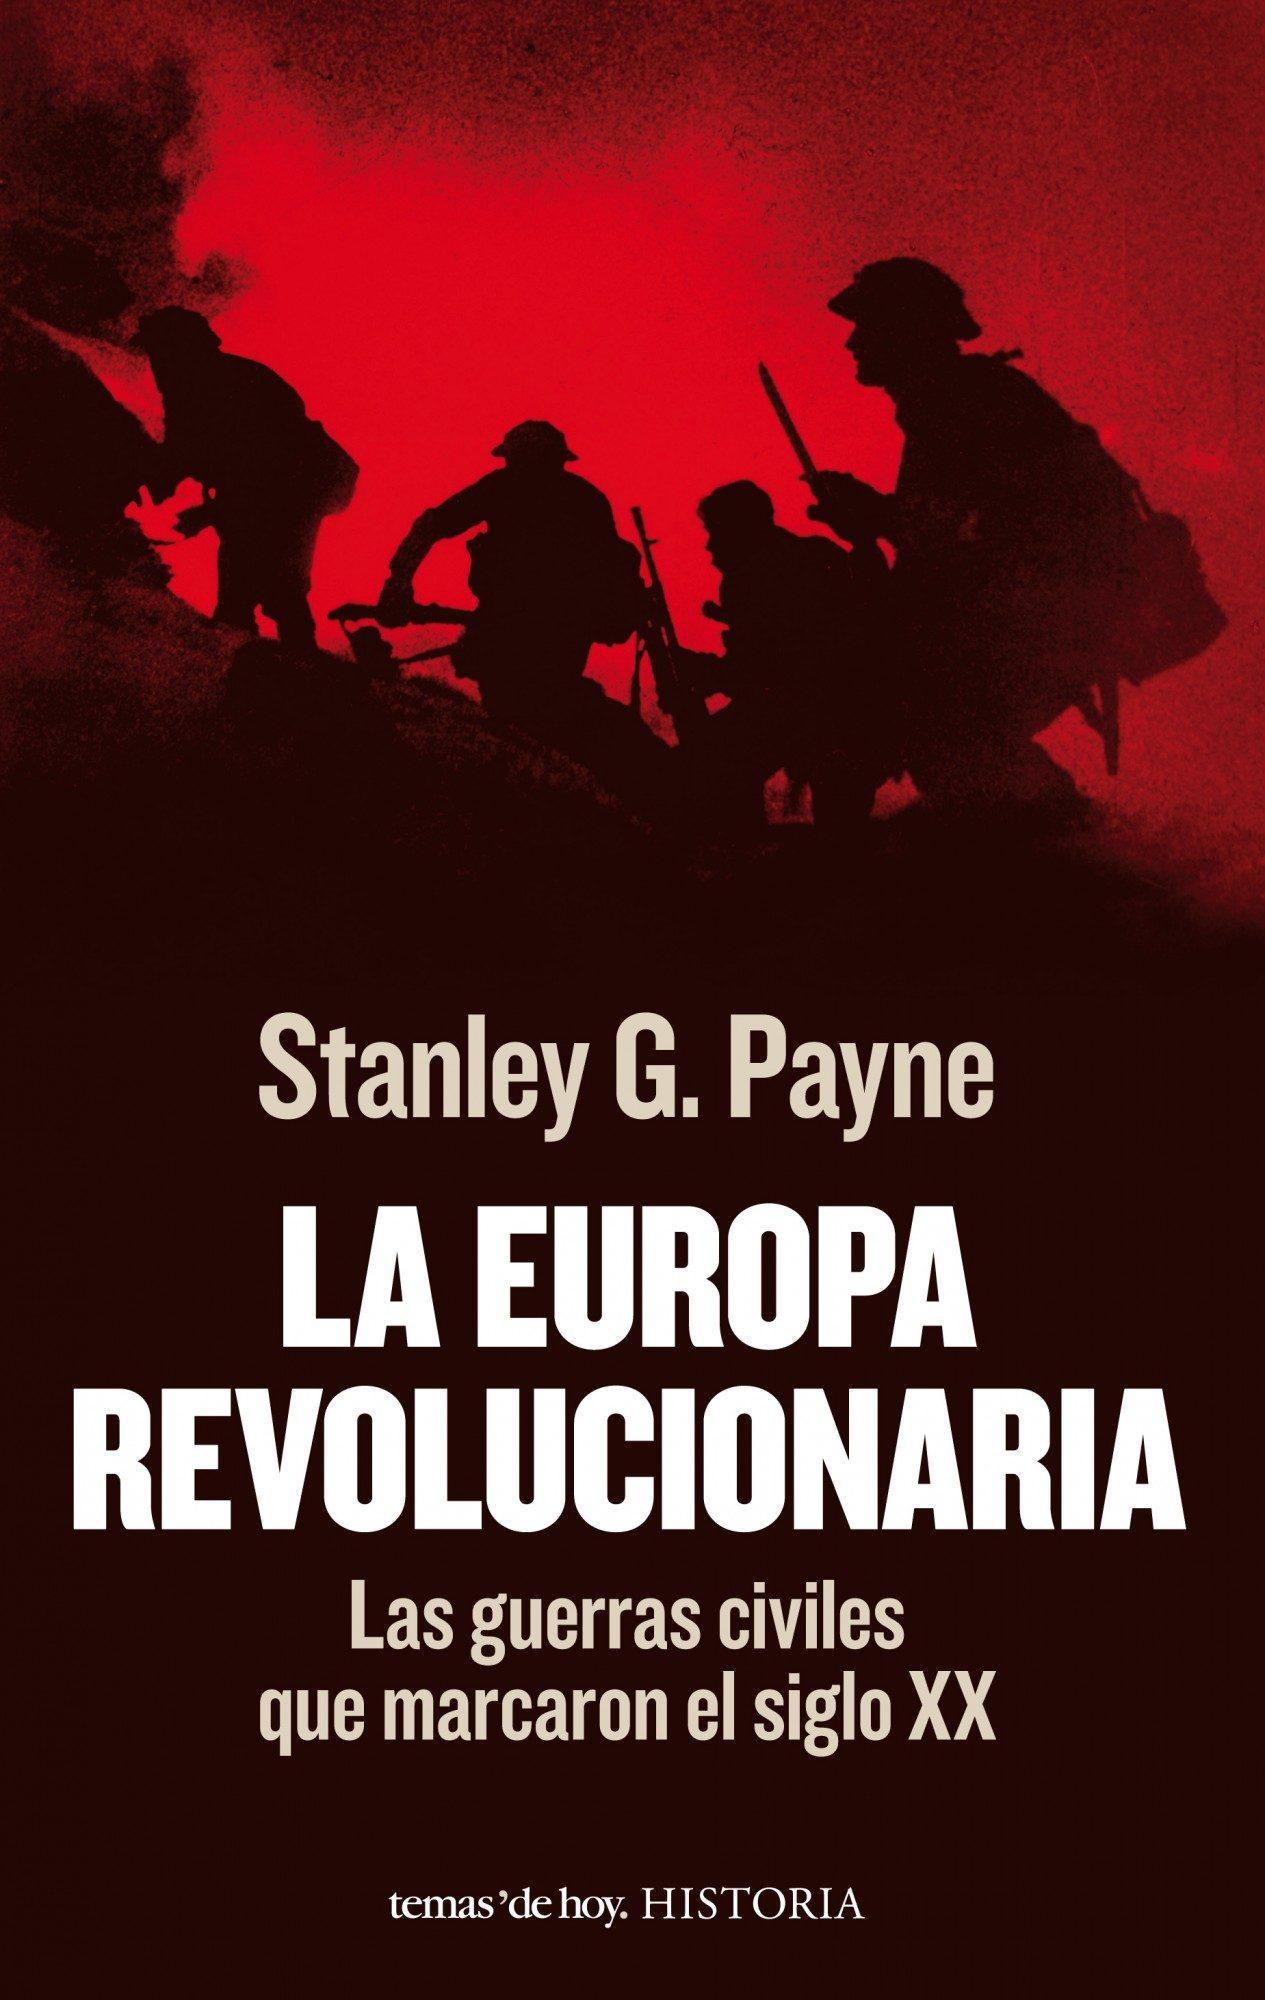 LA EUROPA REVOLUCIONARIA - Stanley G. Payne